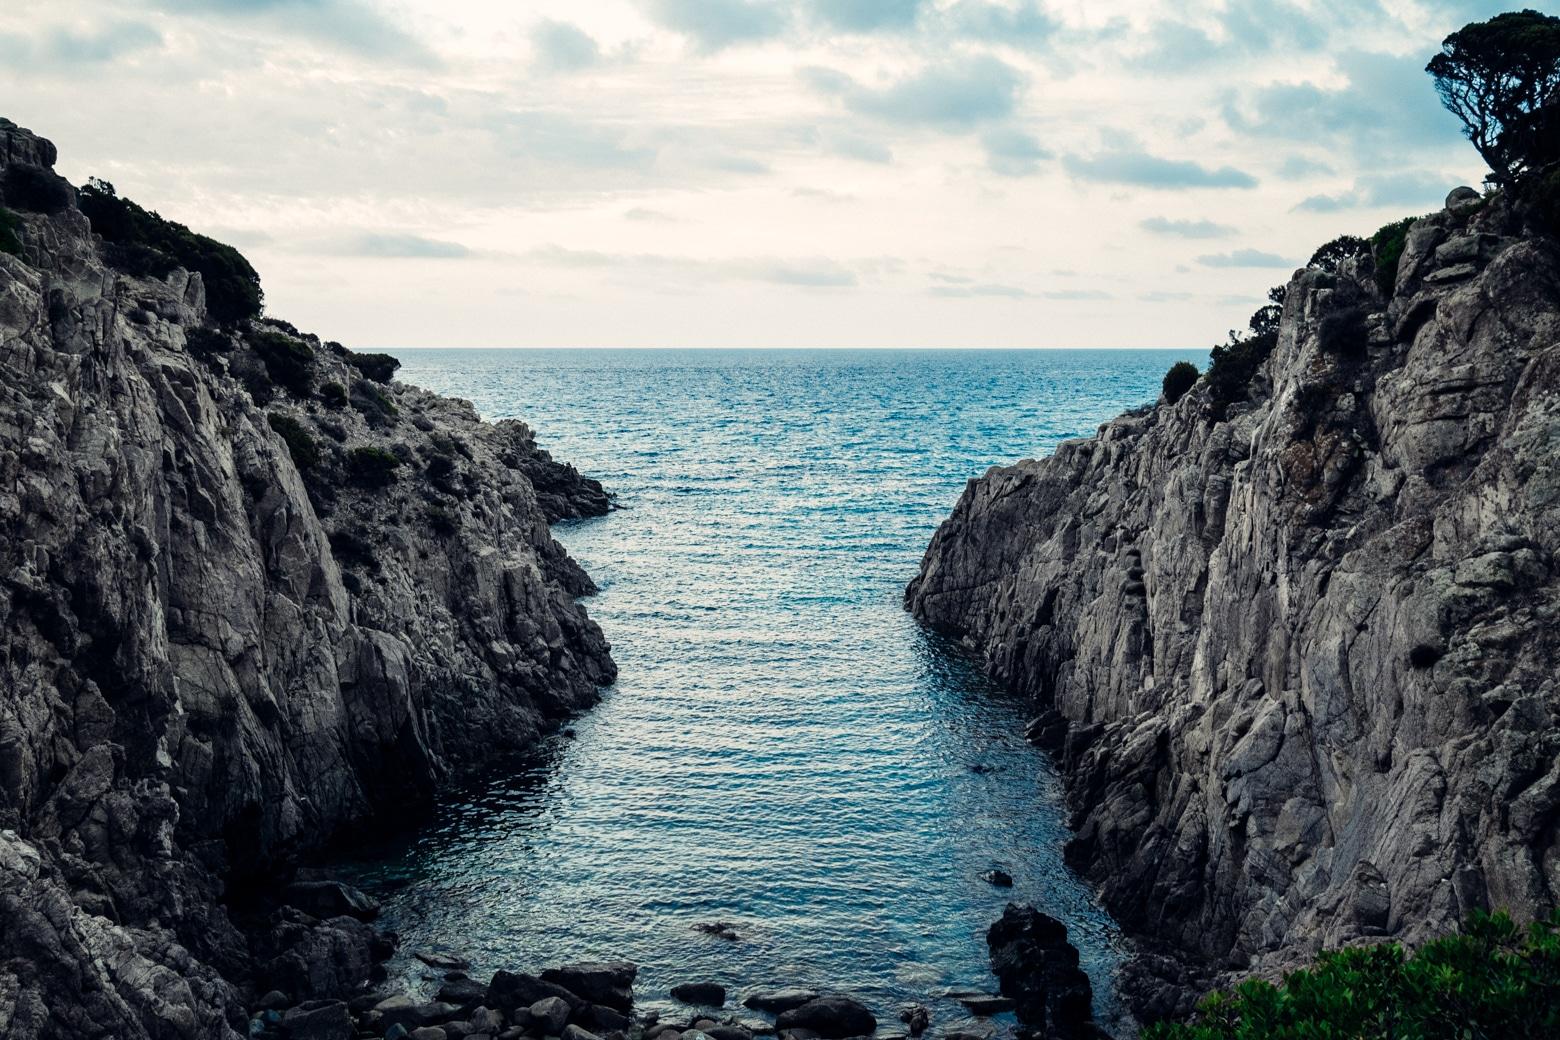 Stunning Rocky Coastline in Chia